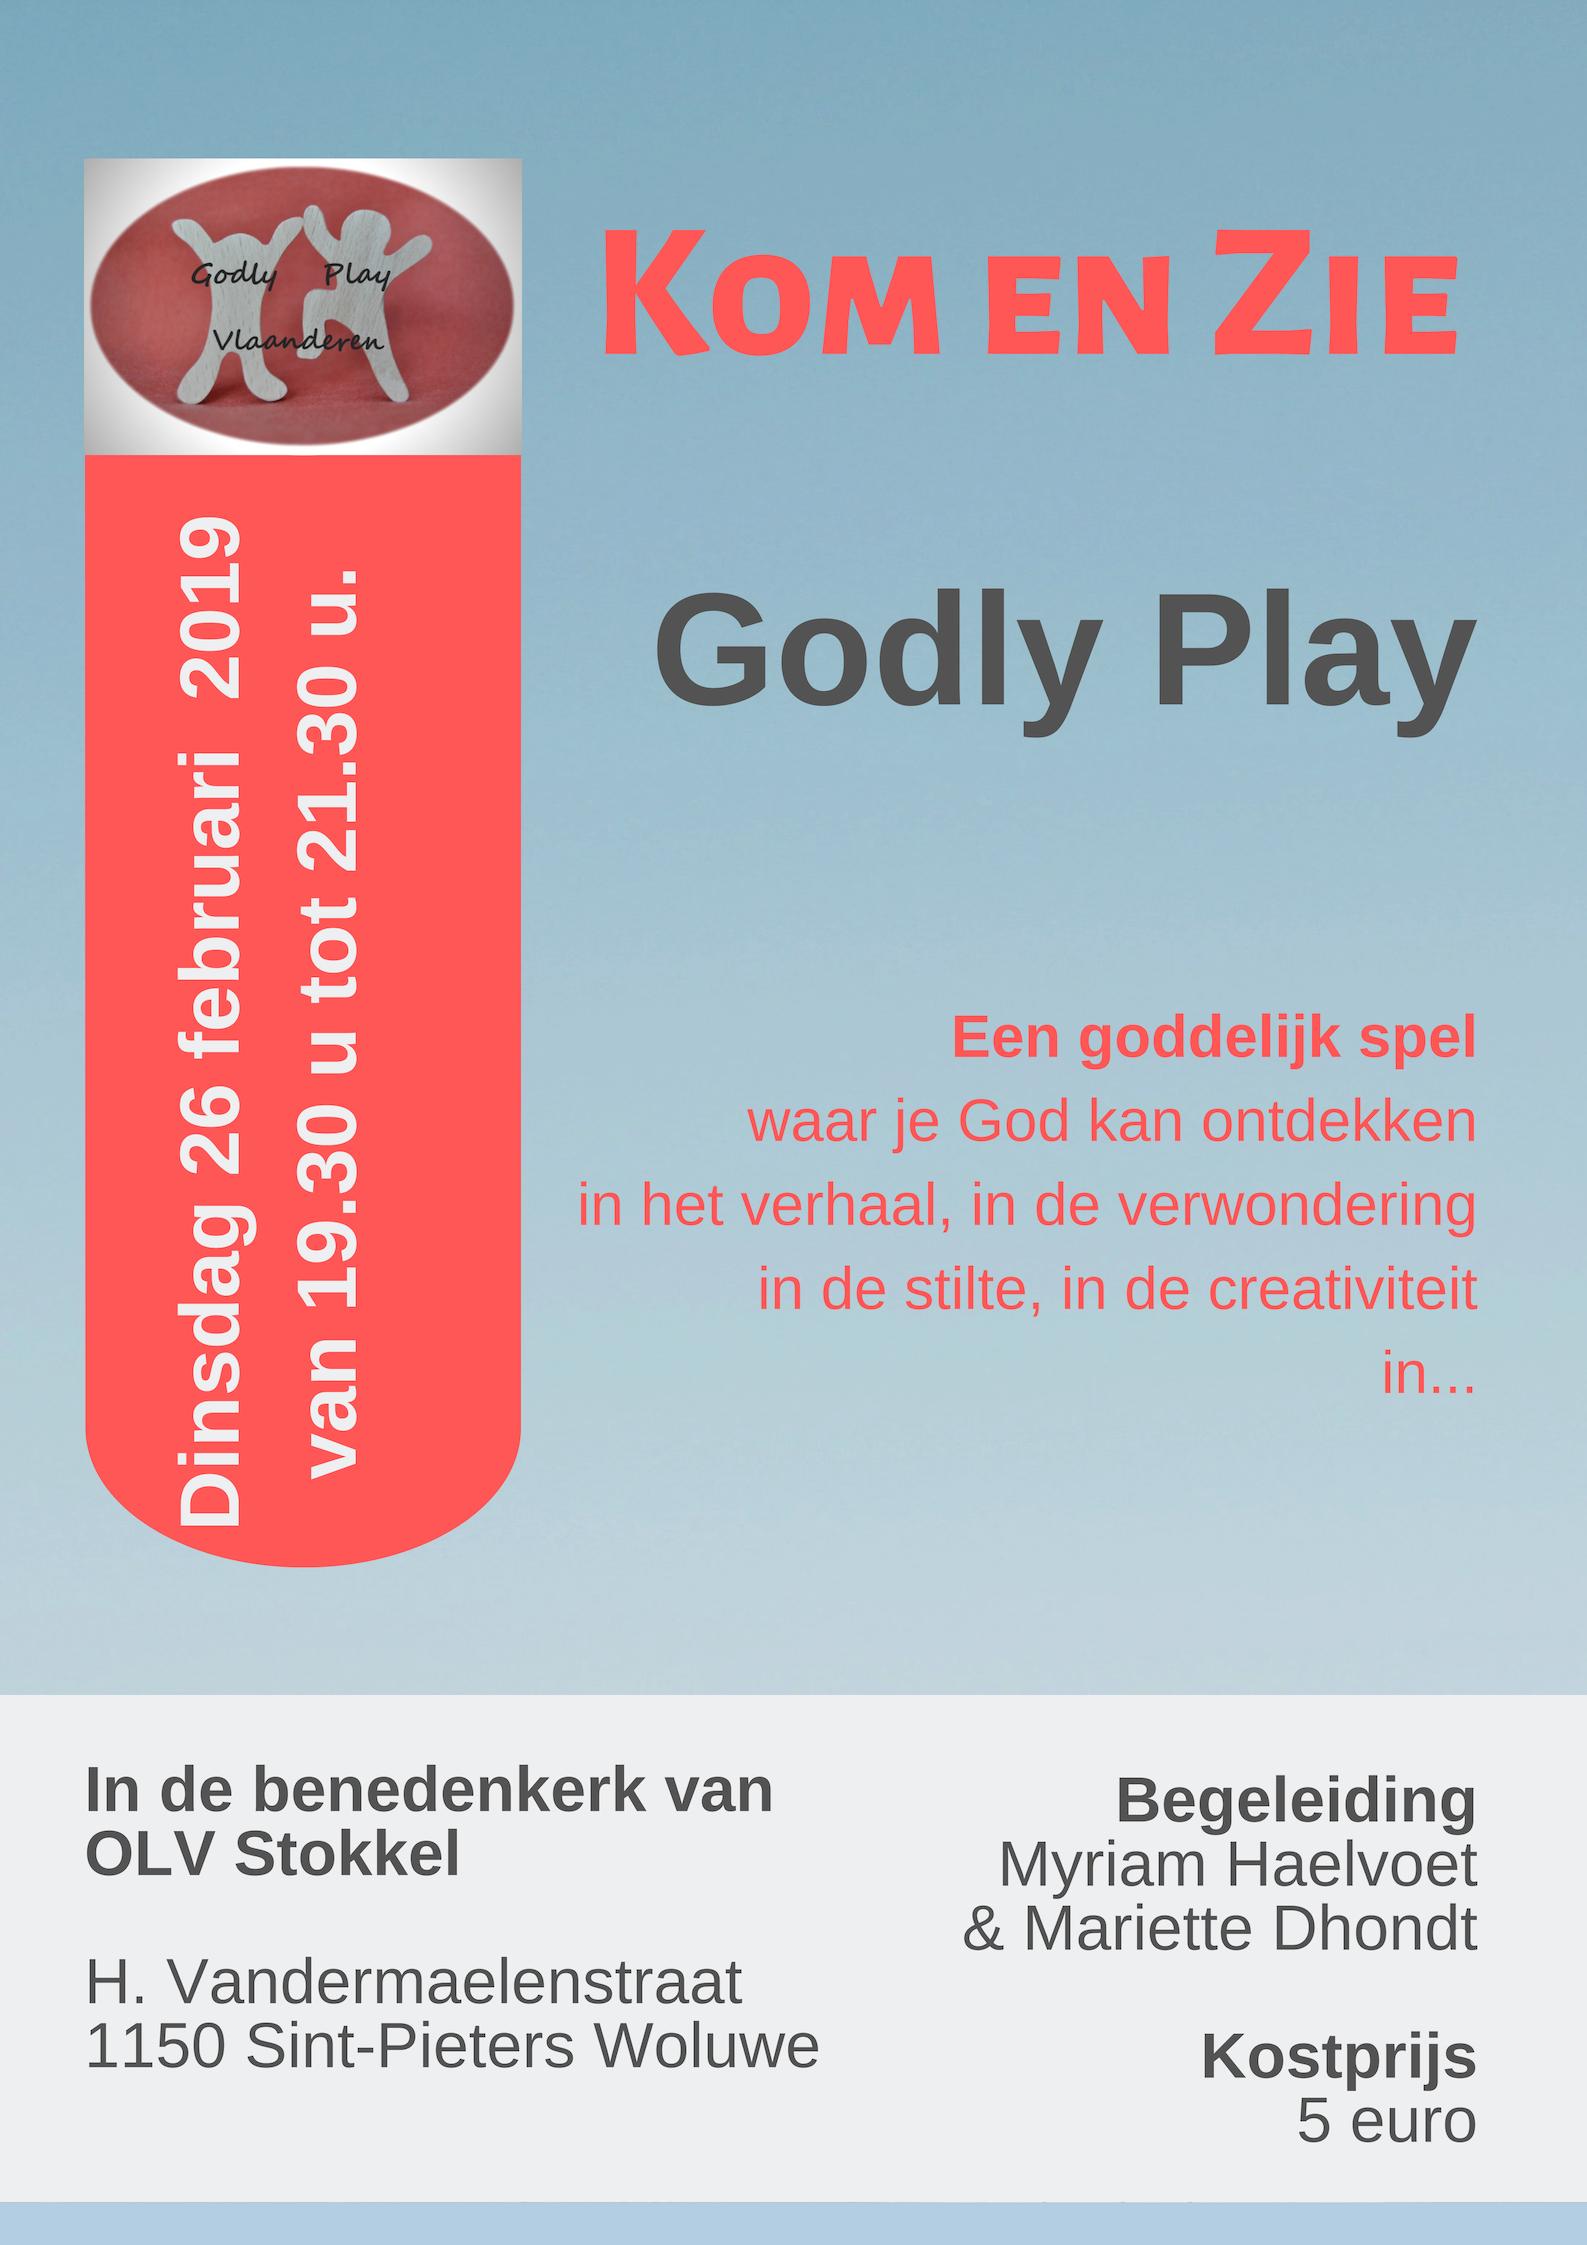 Godly Play Kom en Zie-avond op 26 februari 2019